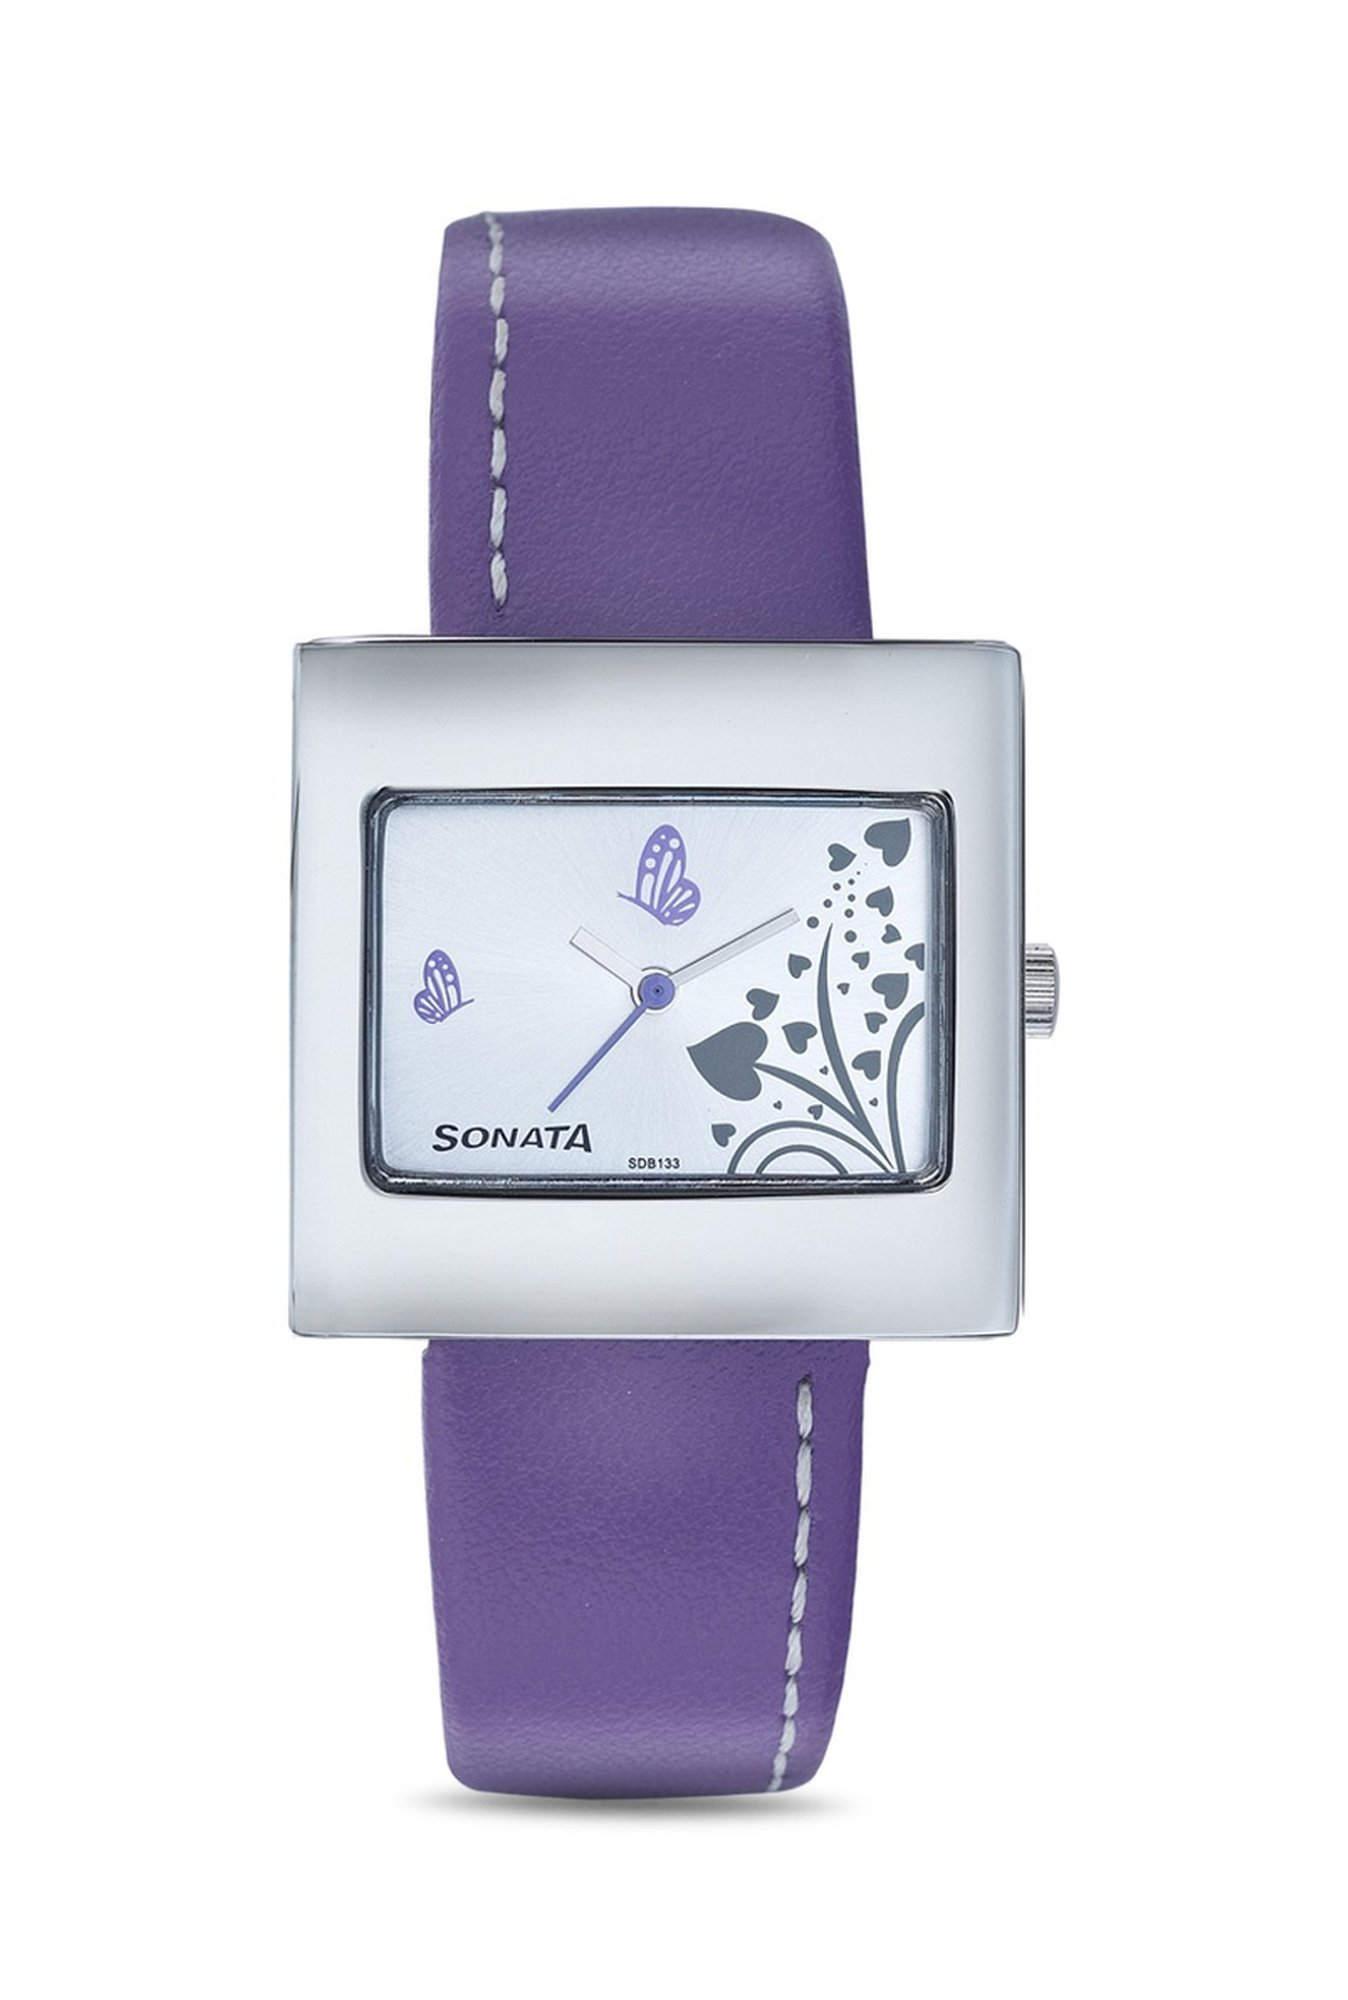 Sonata NG8965SL02AC Yuva Fashion Analog White Dial Women's Watch (NG8965SL02AC)